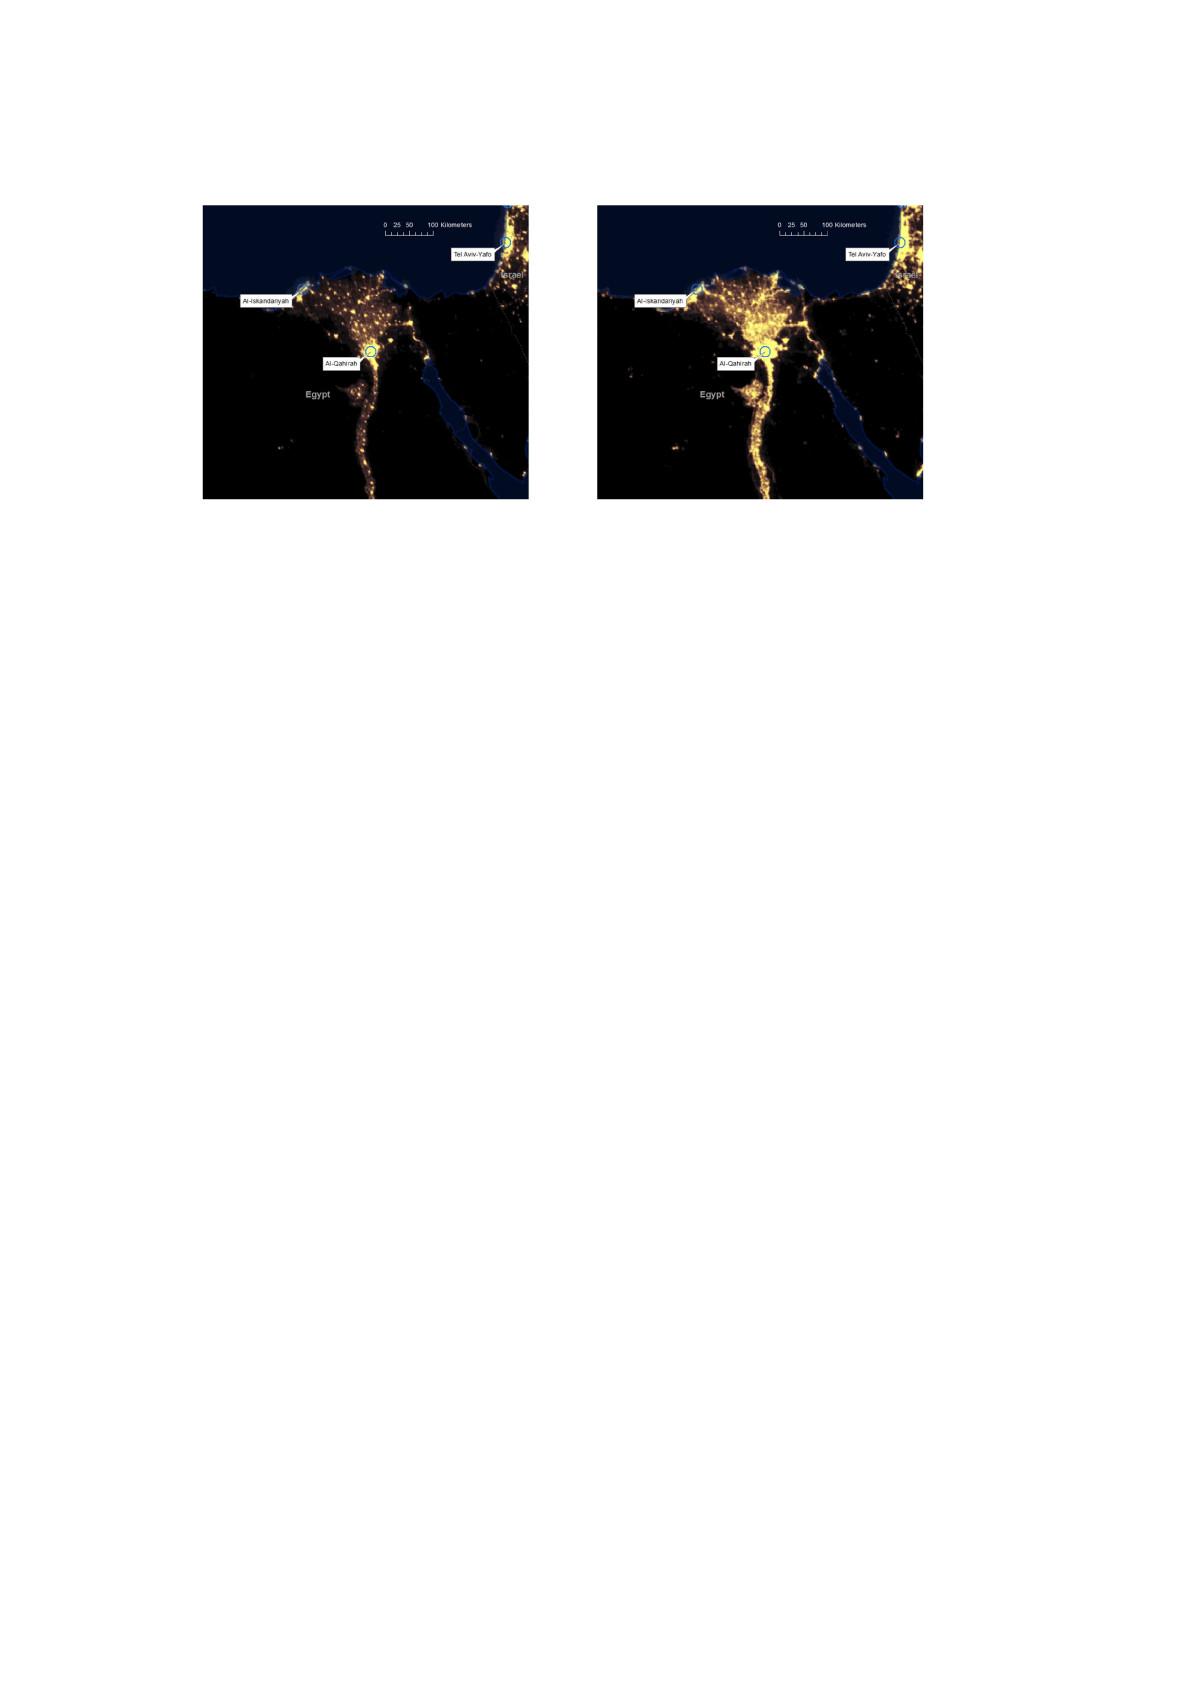 https://static-content.springer.com/image/art%3A10.1140%2Fepjds19/MediaObjects/13688_2013_Article_23_Fig13_HTML.jpg